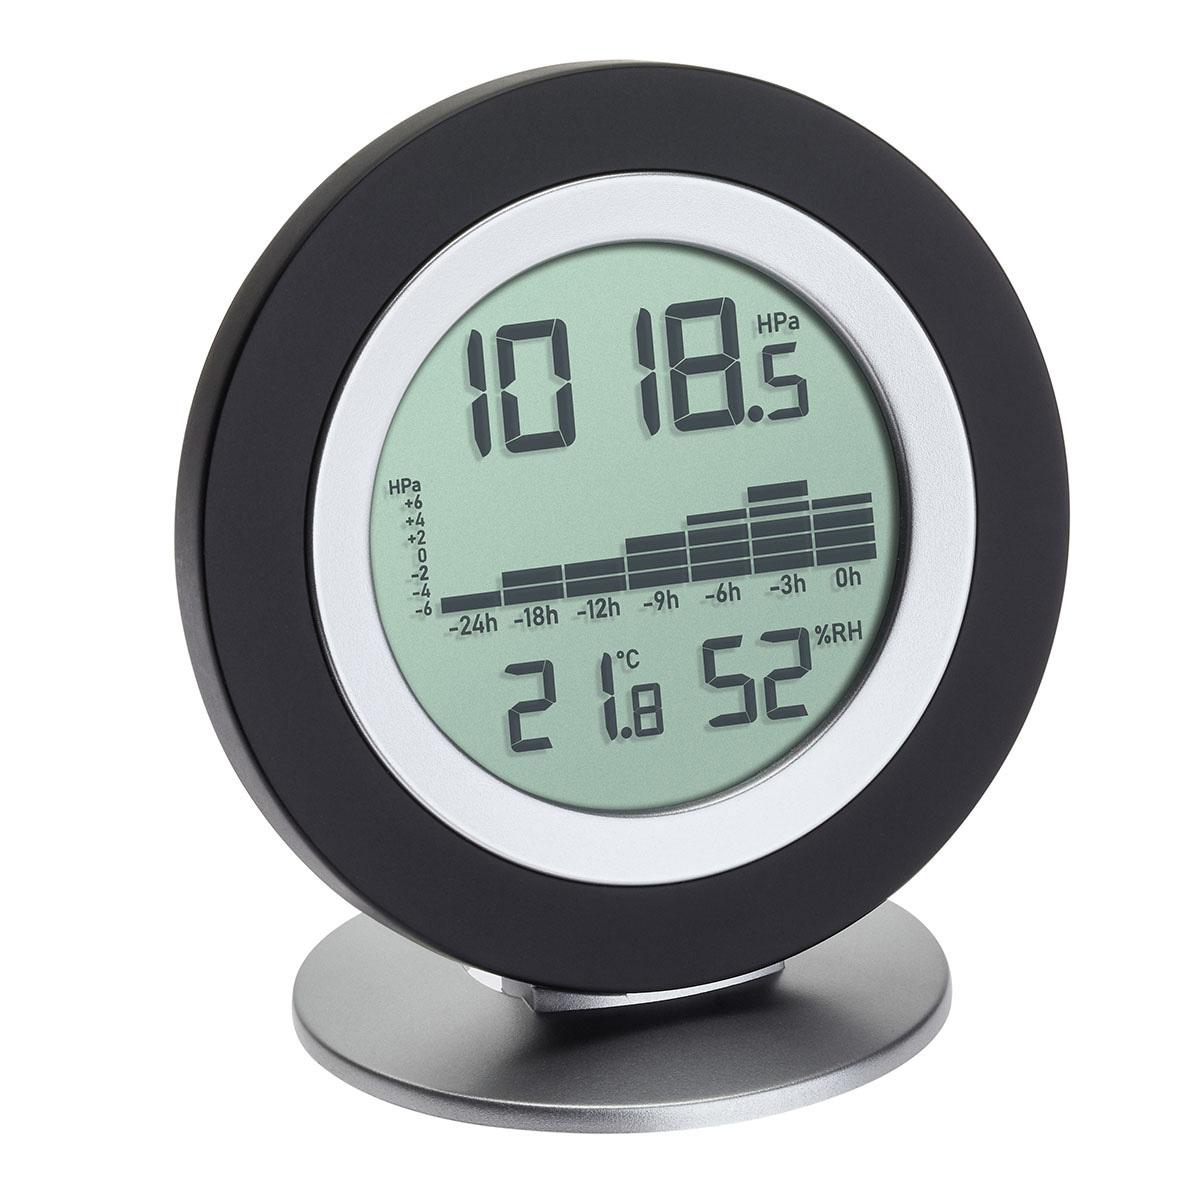 35-1154-01-digitales-barometer-thermometer-hygrometer-cosy-baro-1200x1200px.jpg